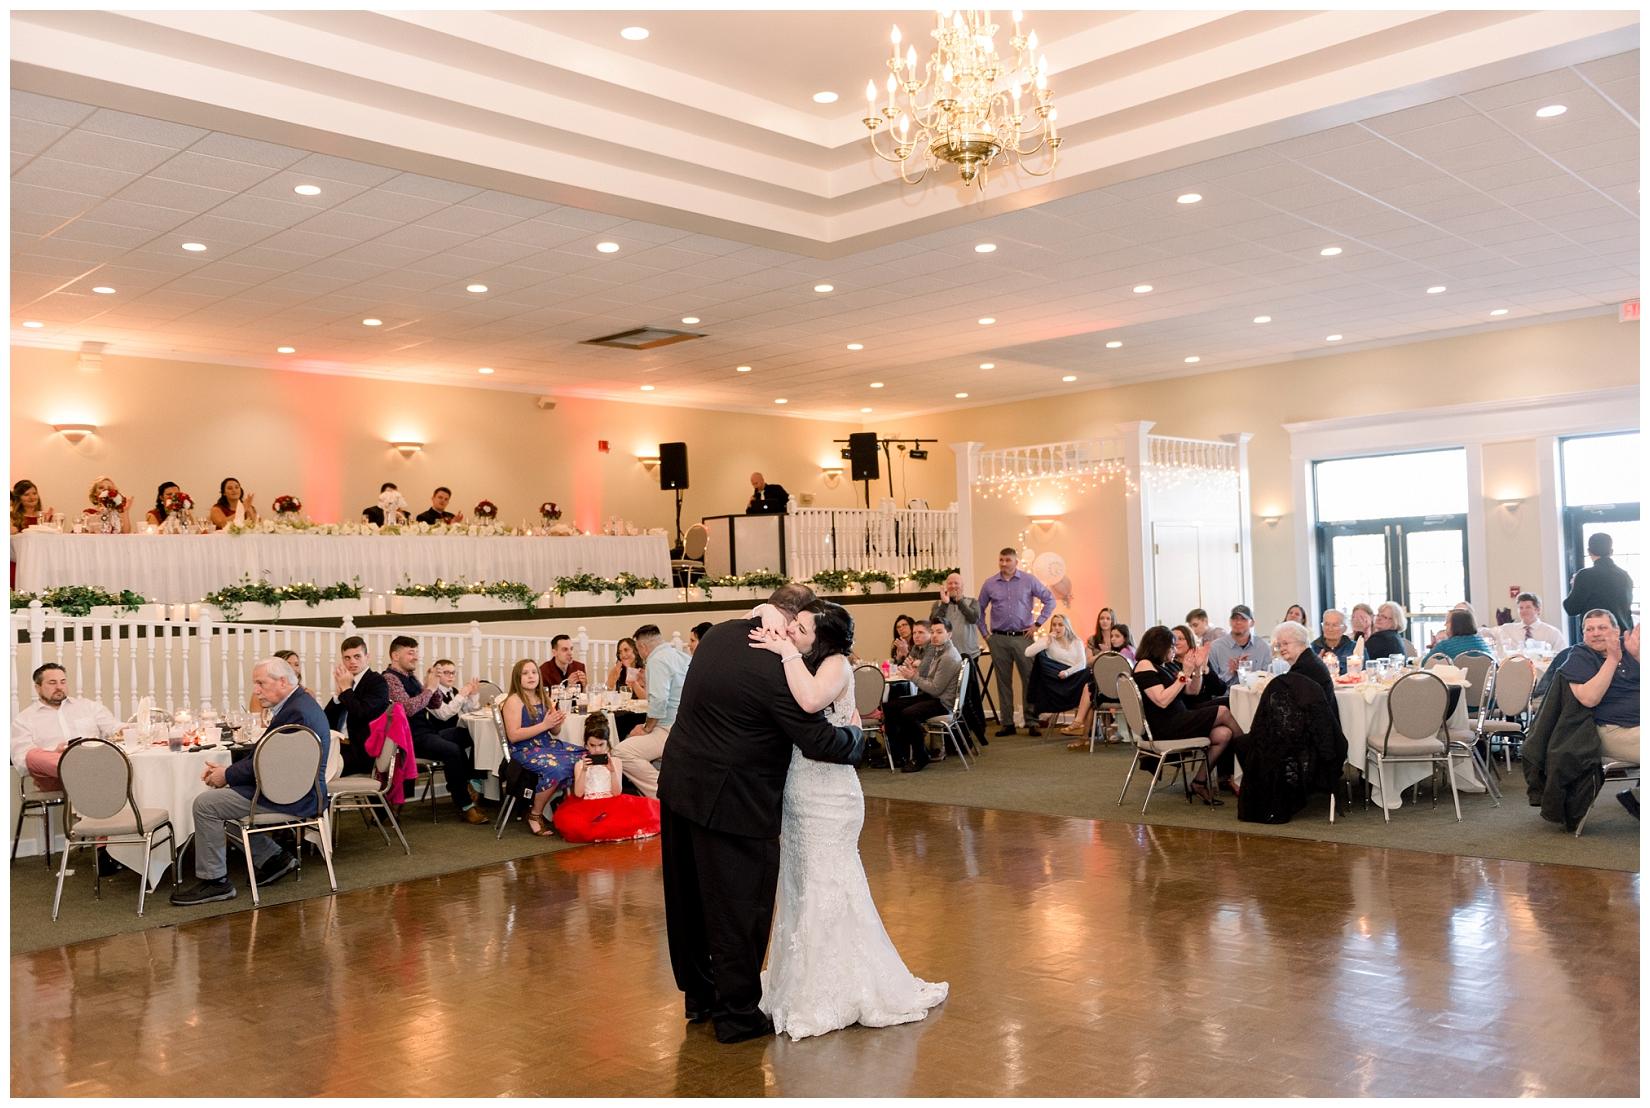 cat-alkire-wedding-photographer-indiana-chicago-indianapolis-fort-wayne_1123.jpg